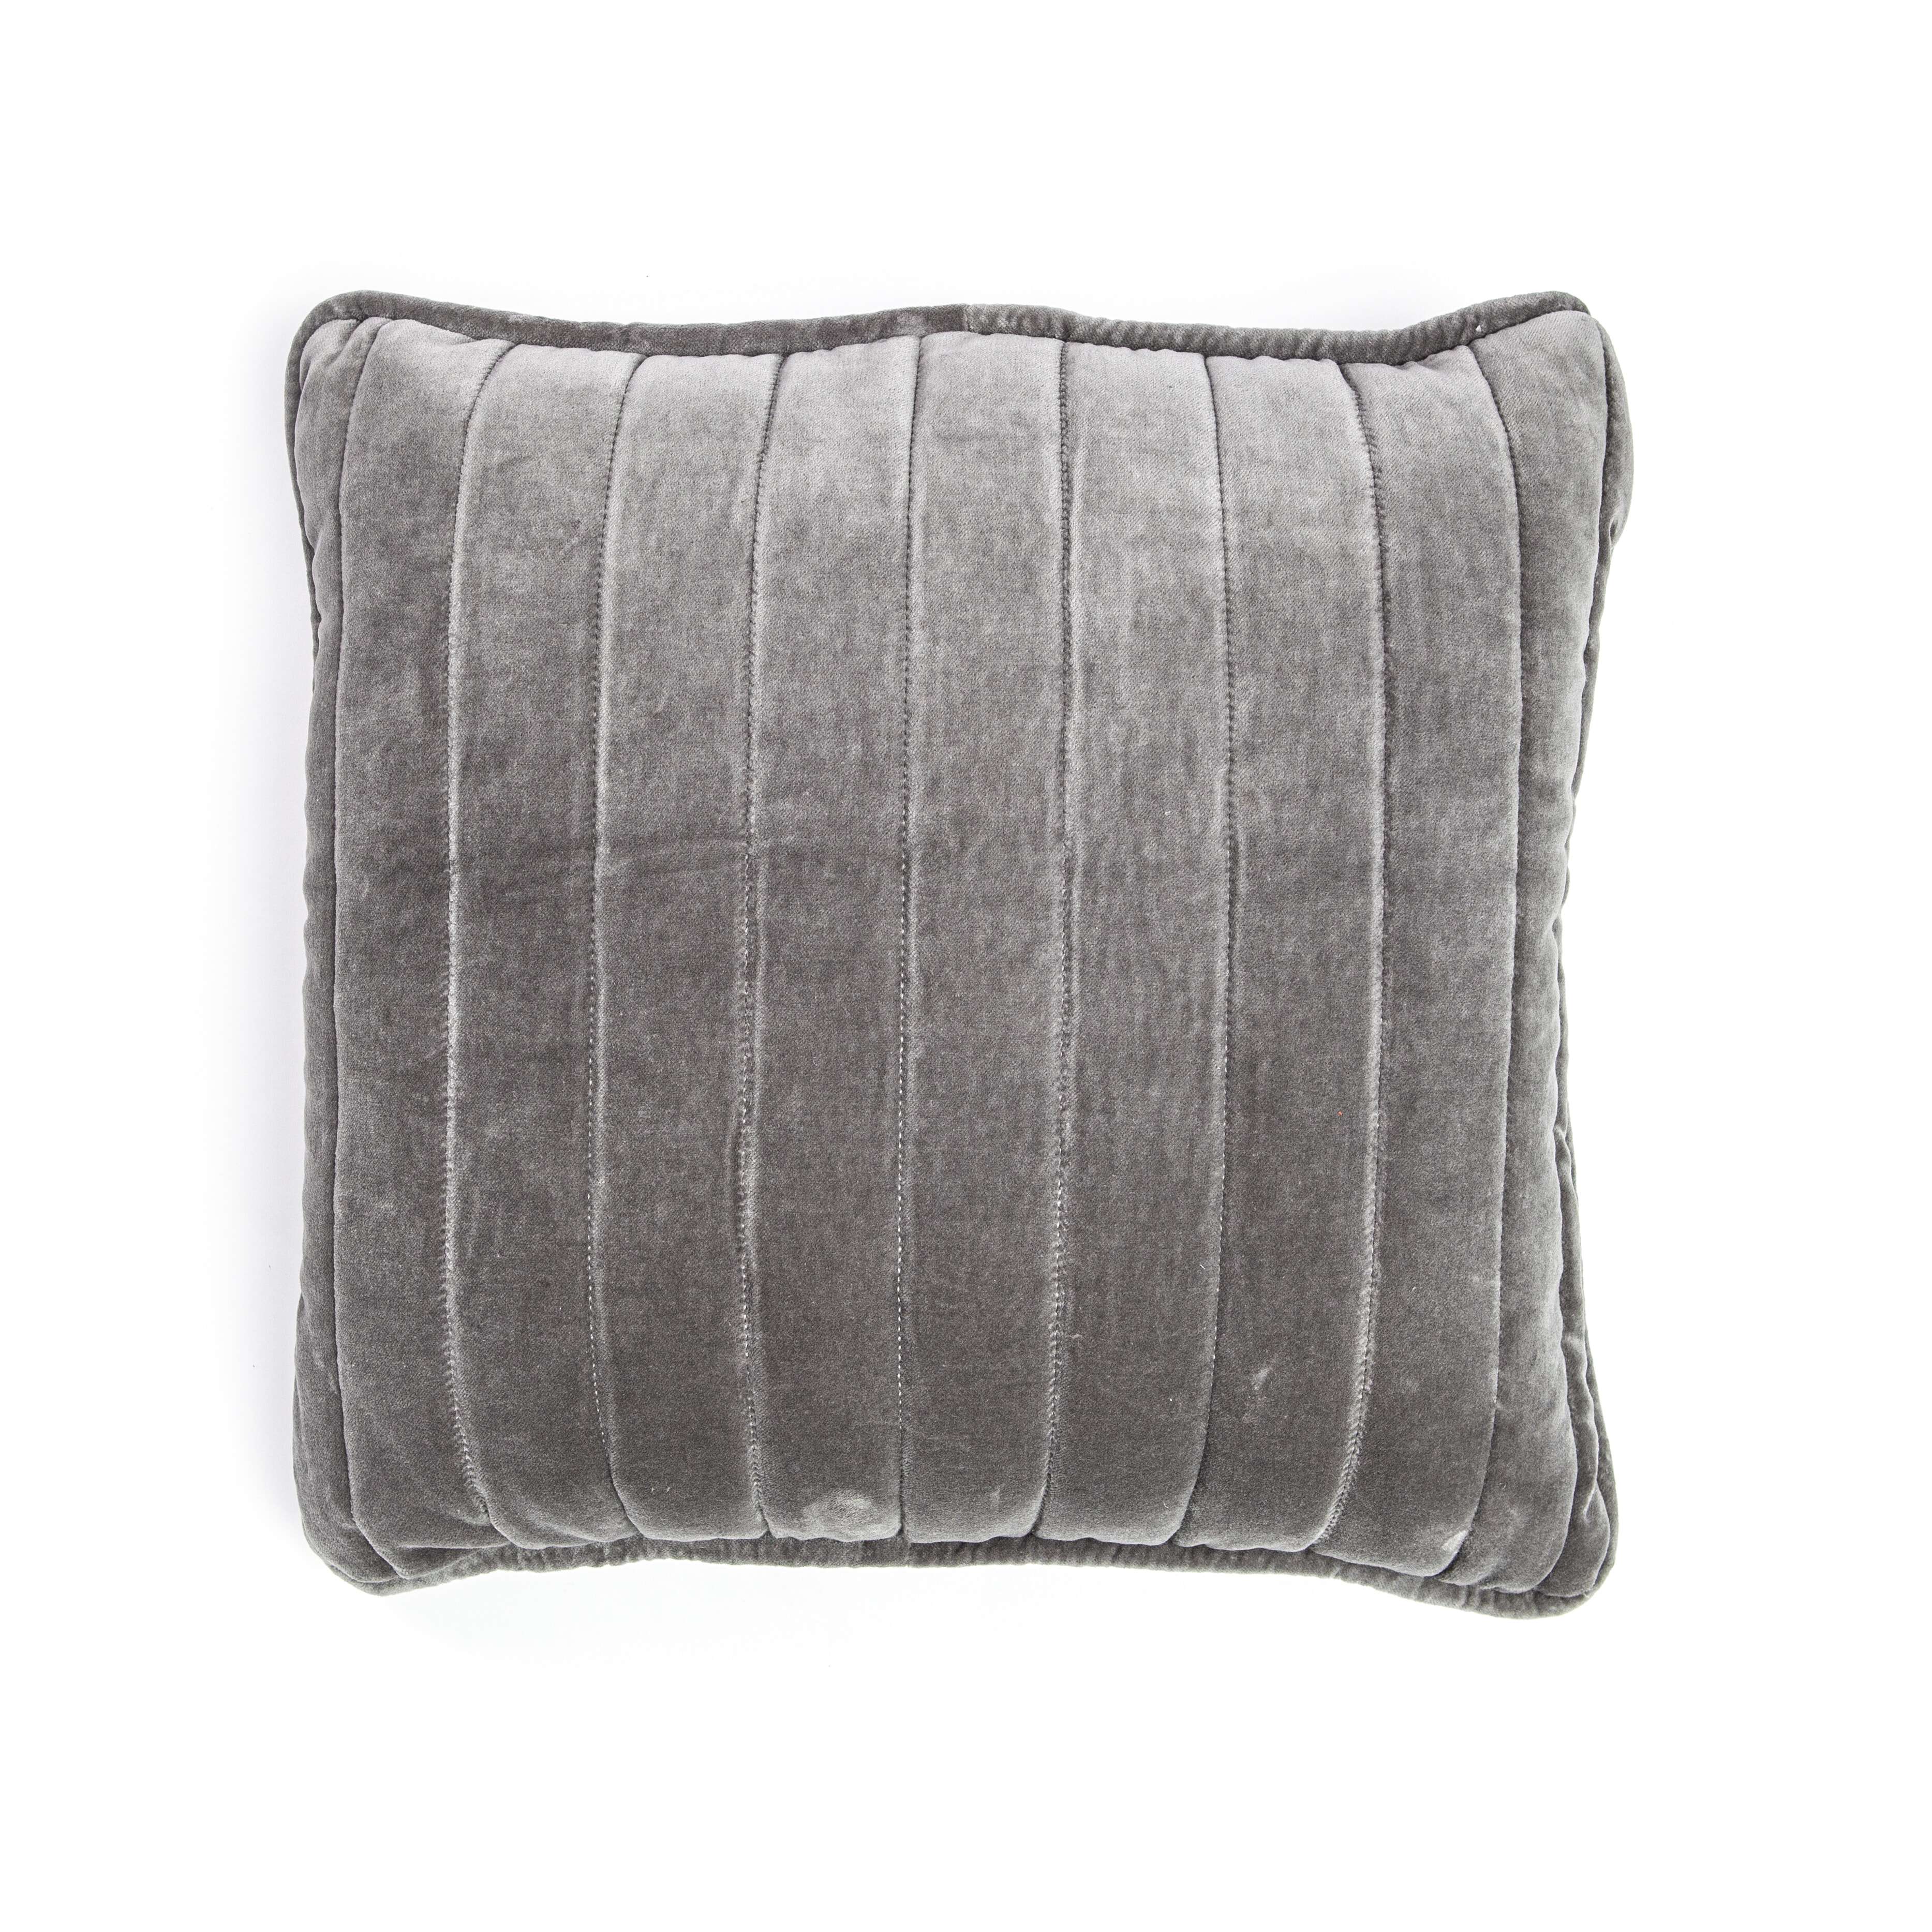 By-Boo Kussen 'Lucy' 45 x 45cm, kleur zilver